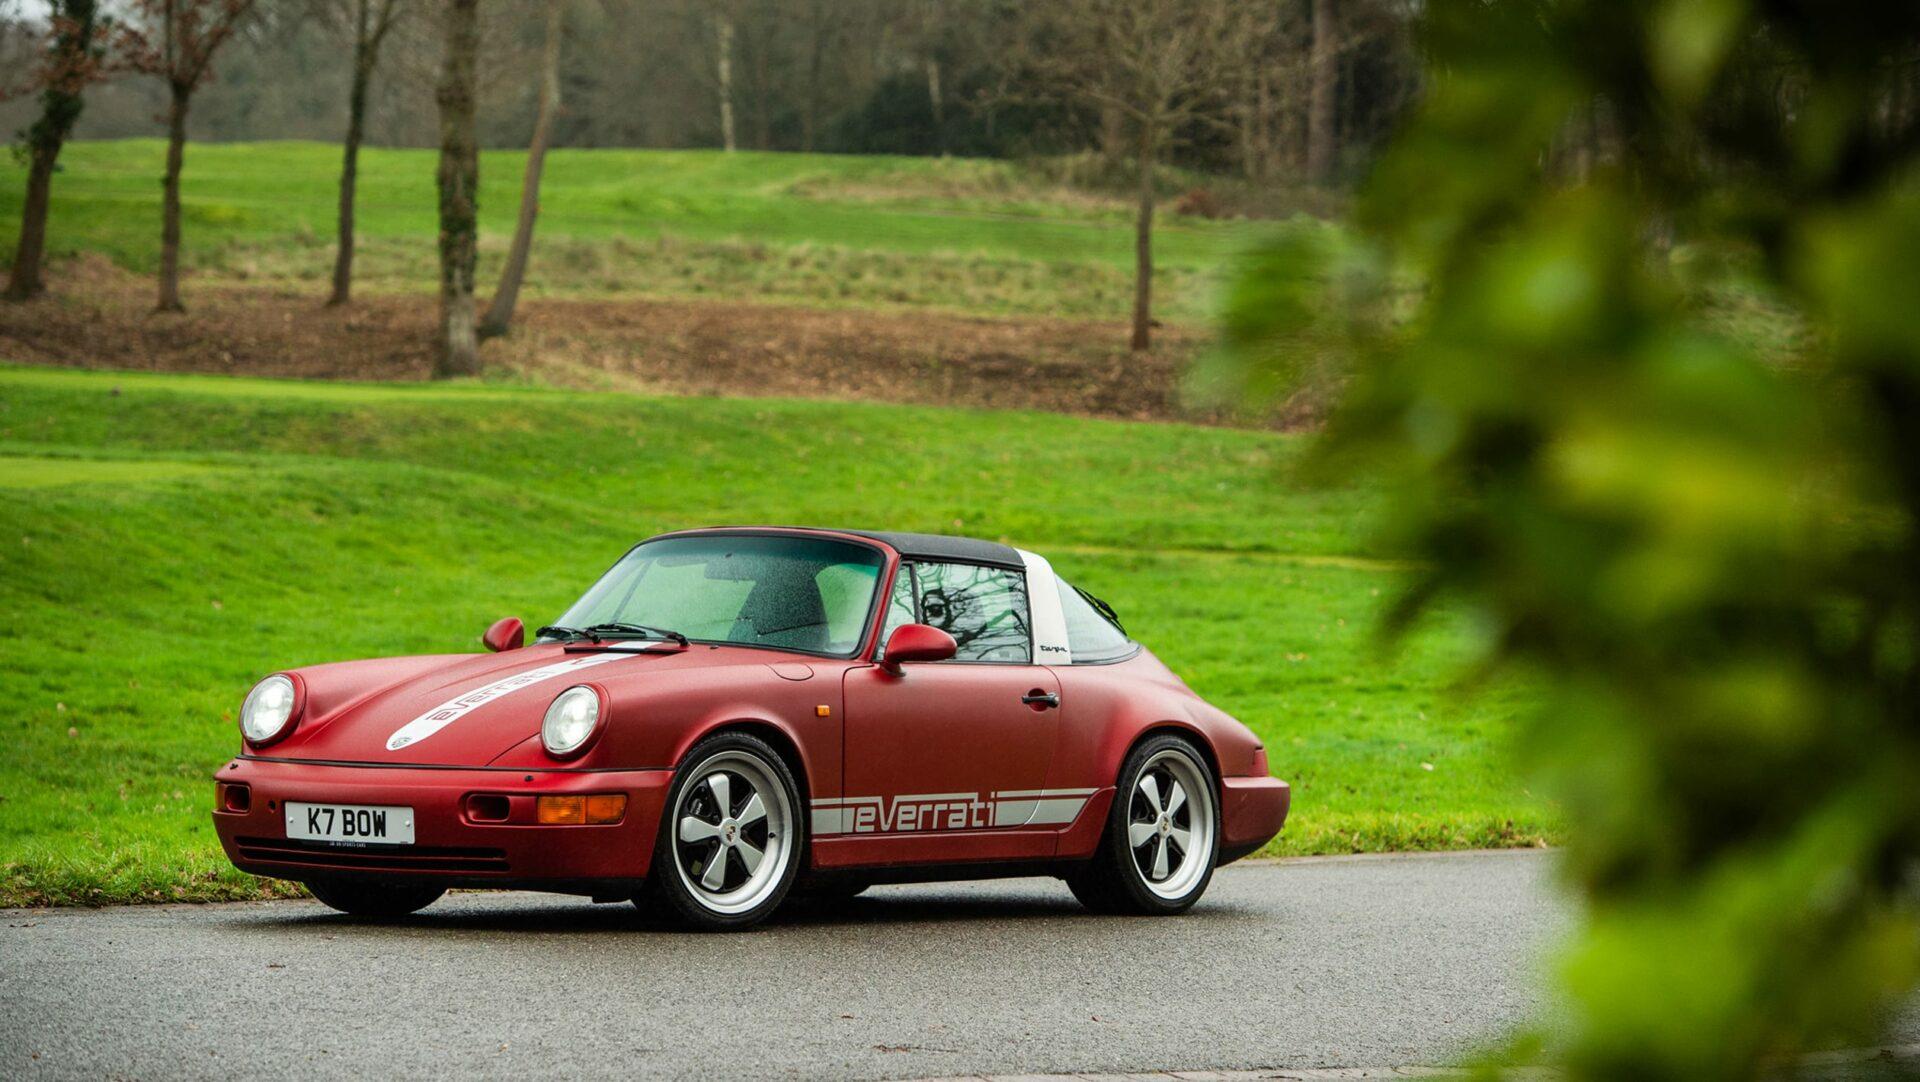 Fotos: Prueba Everrati Porsche 964